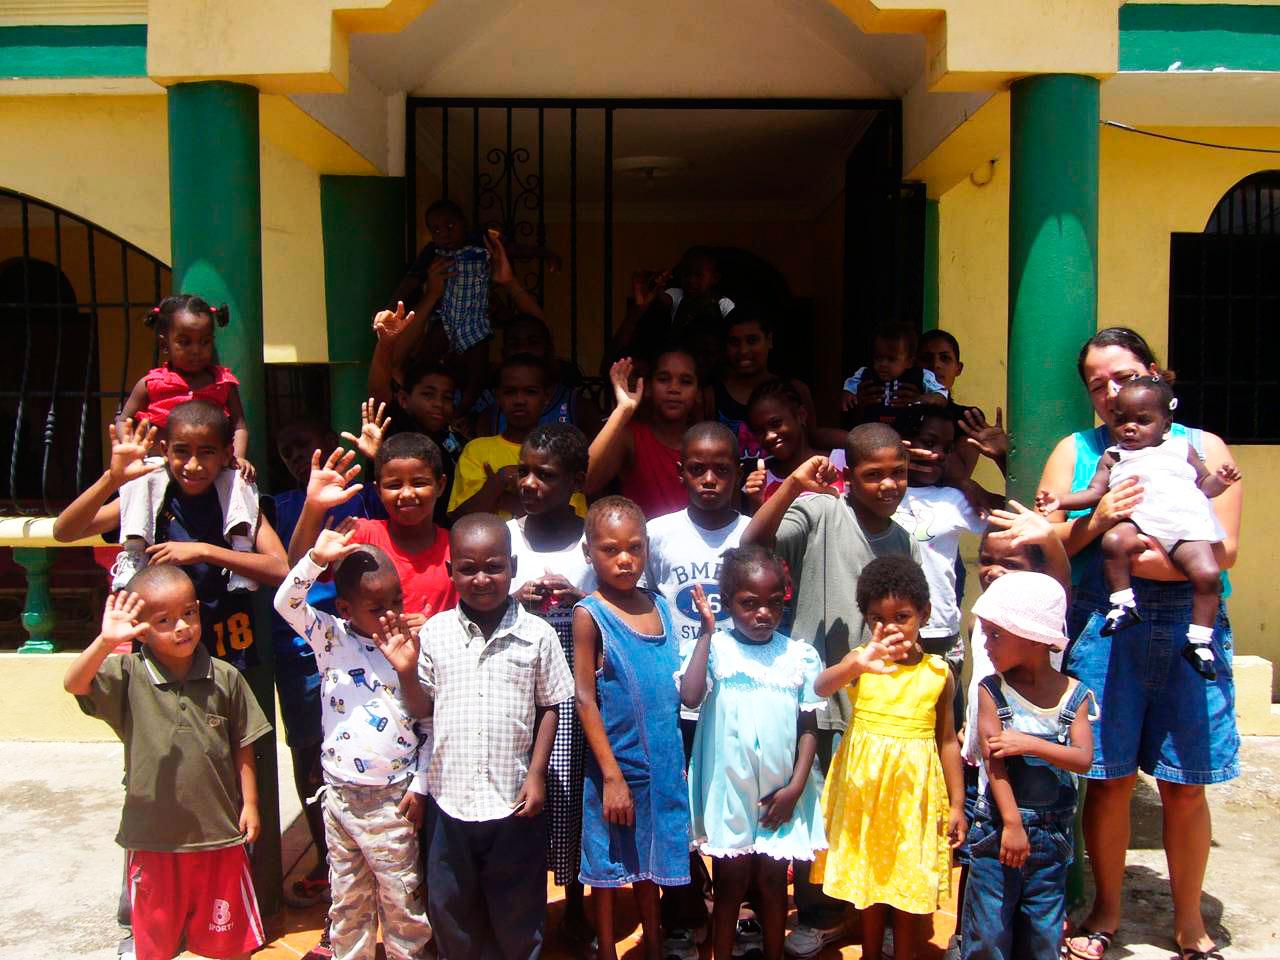 Remar Republica Dominicana